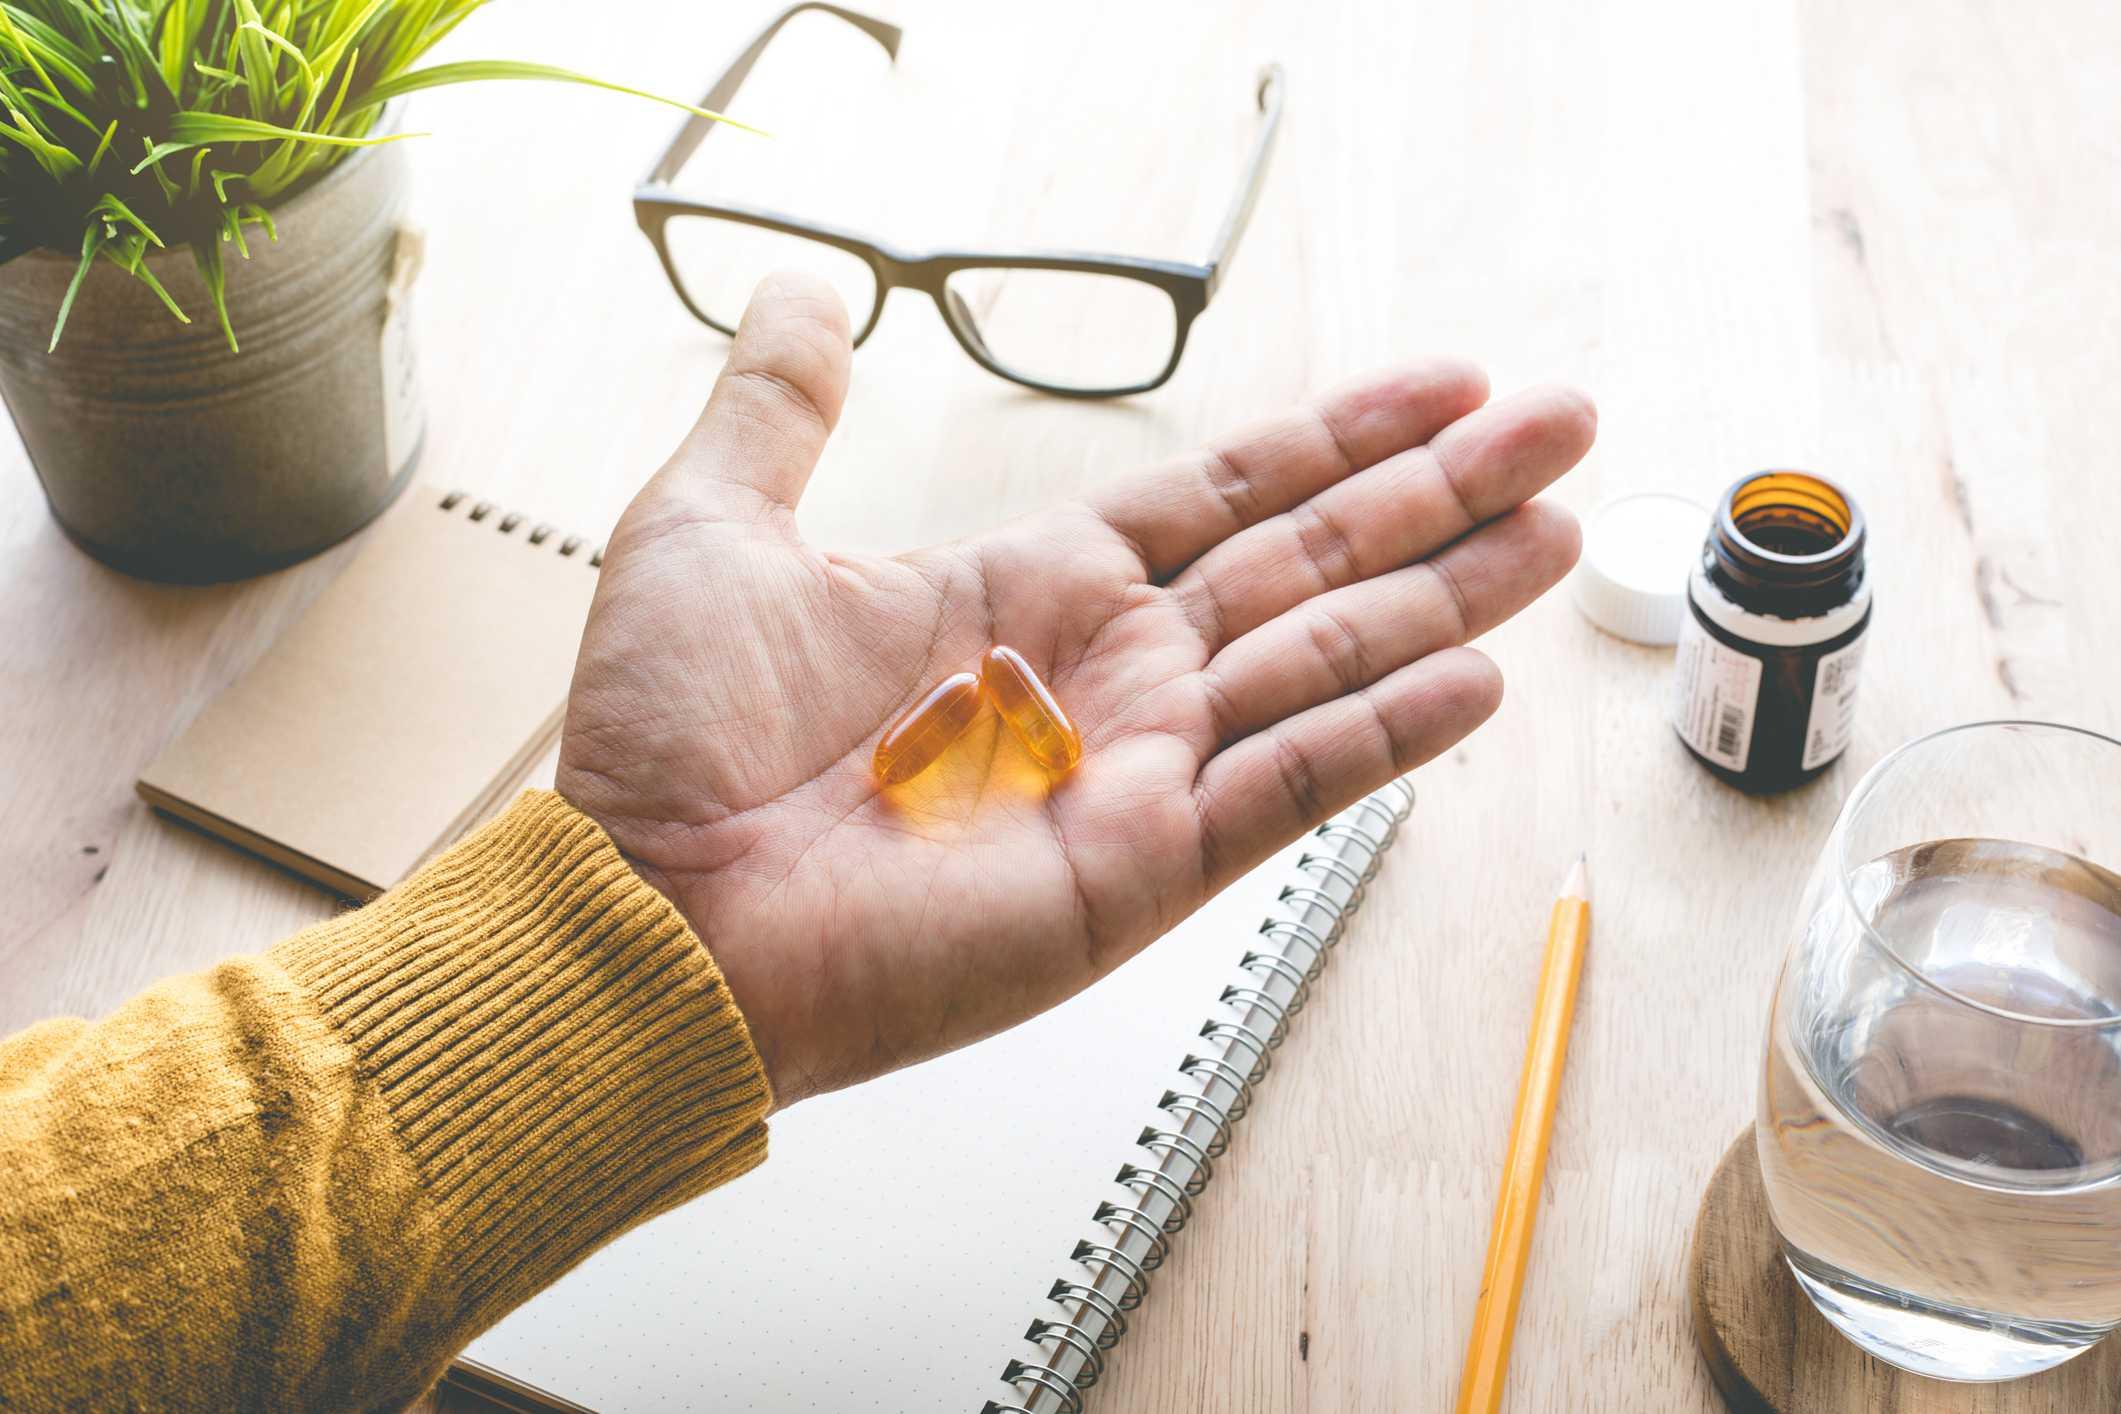 Taking Multivitamins for Diabetes